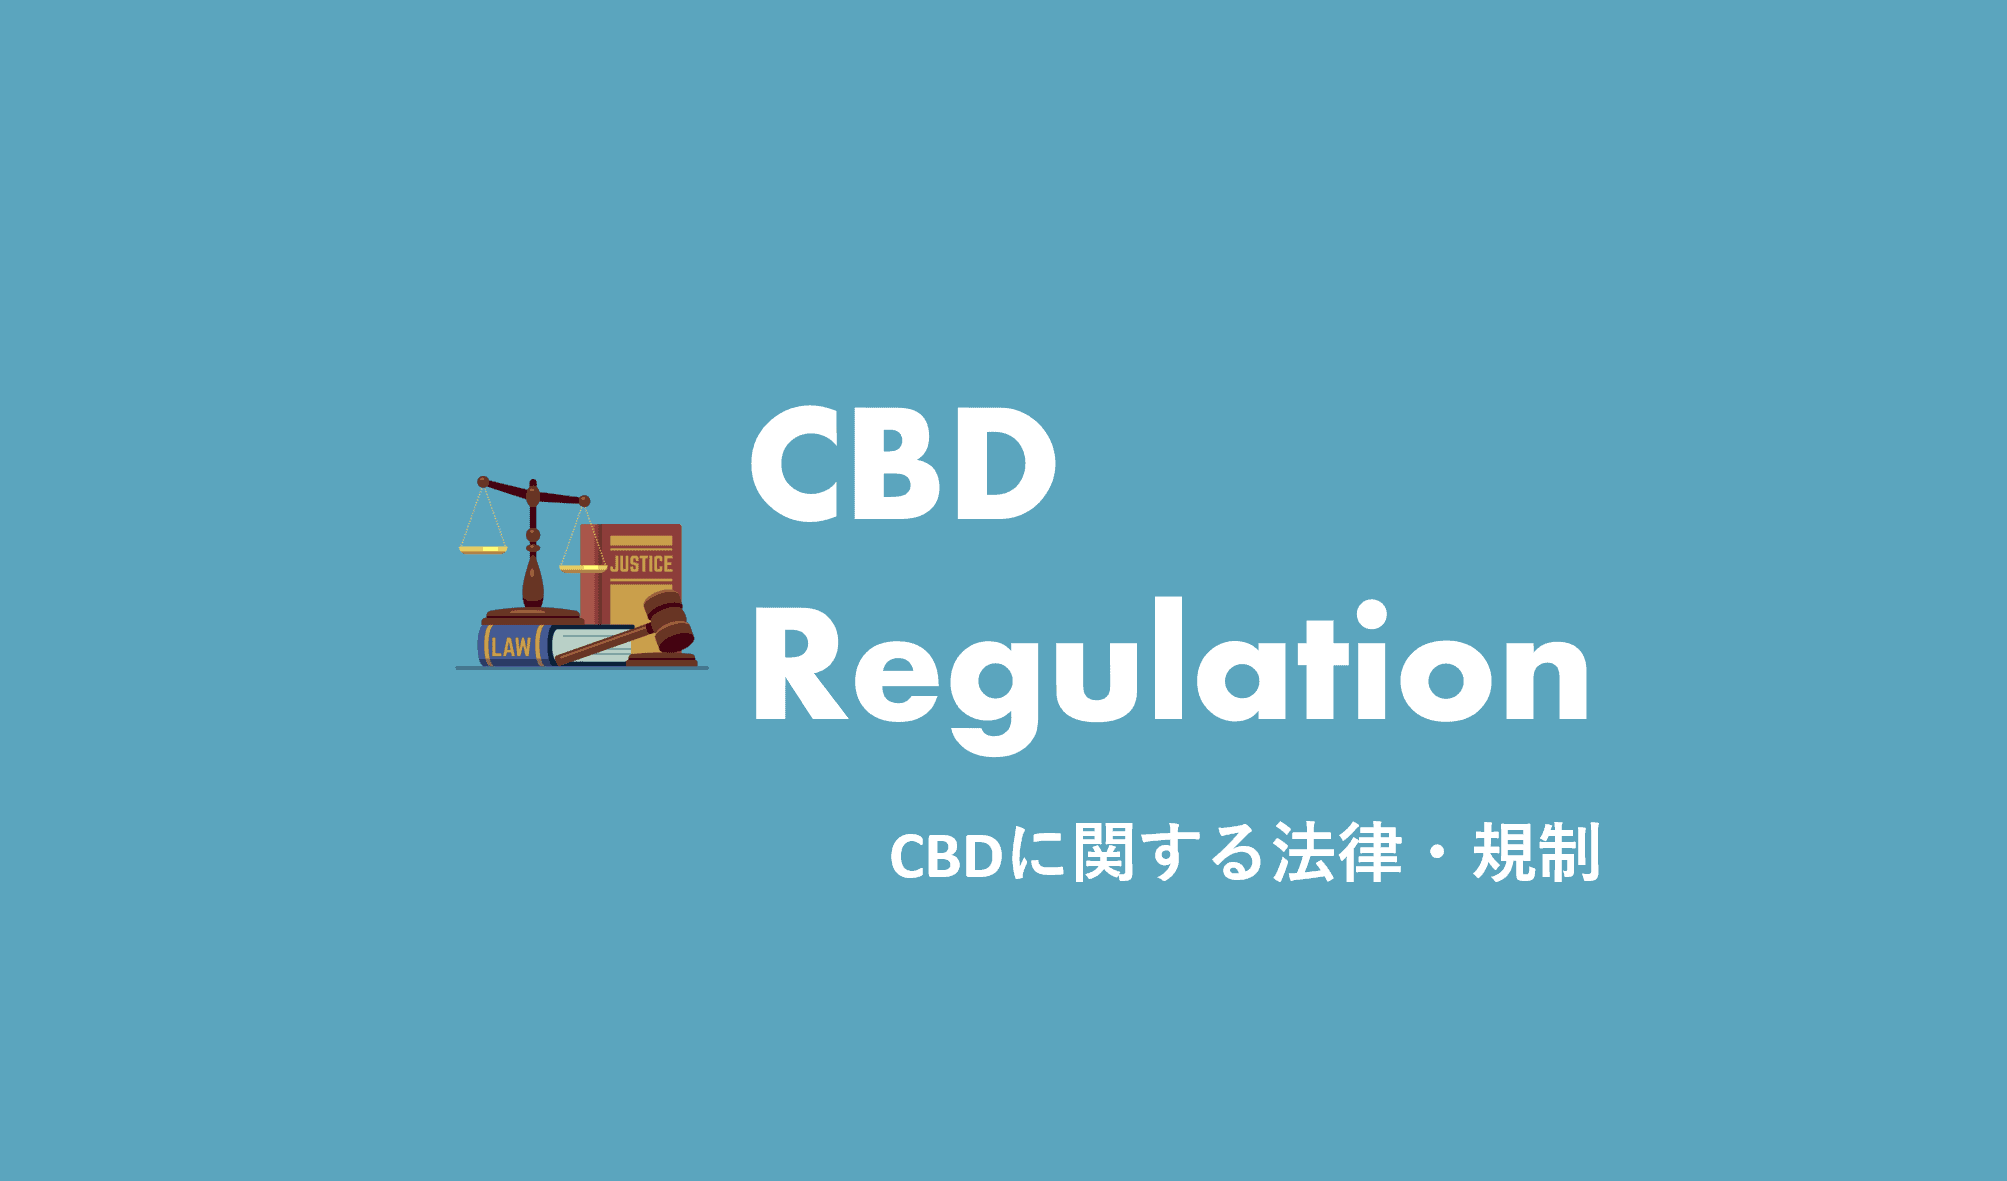 CBDの法律を解説。 2020年4月 厚生労働省発表の内容とは?